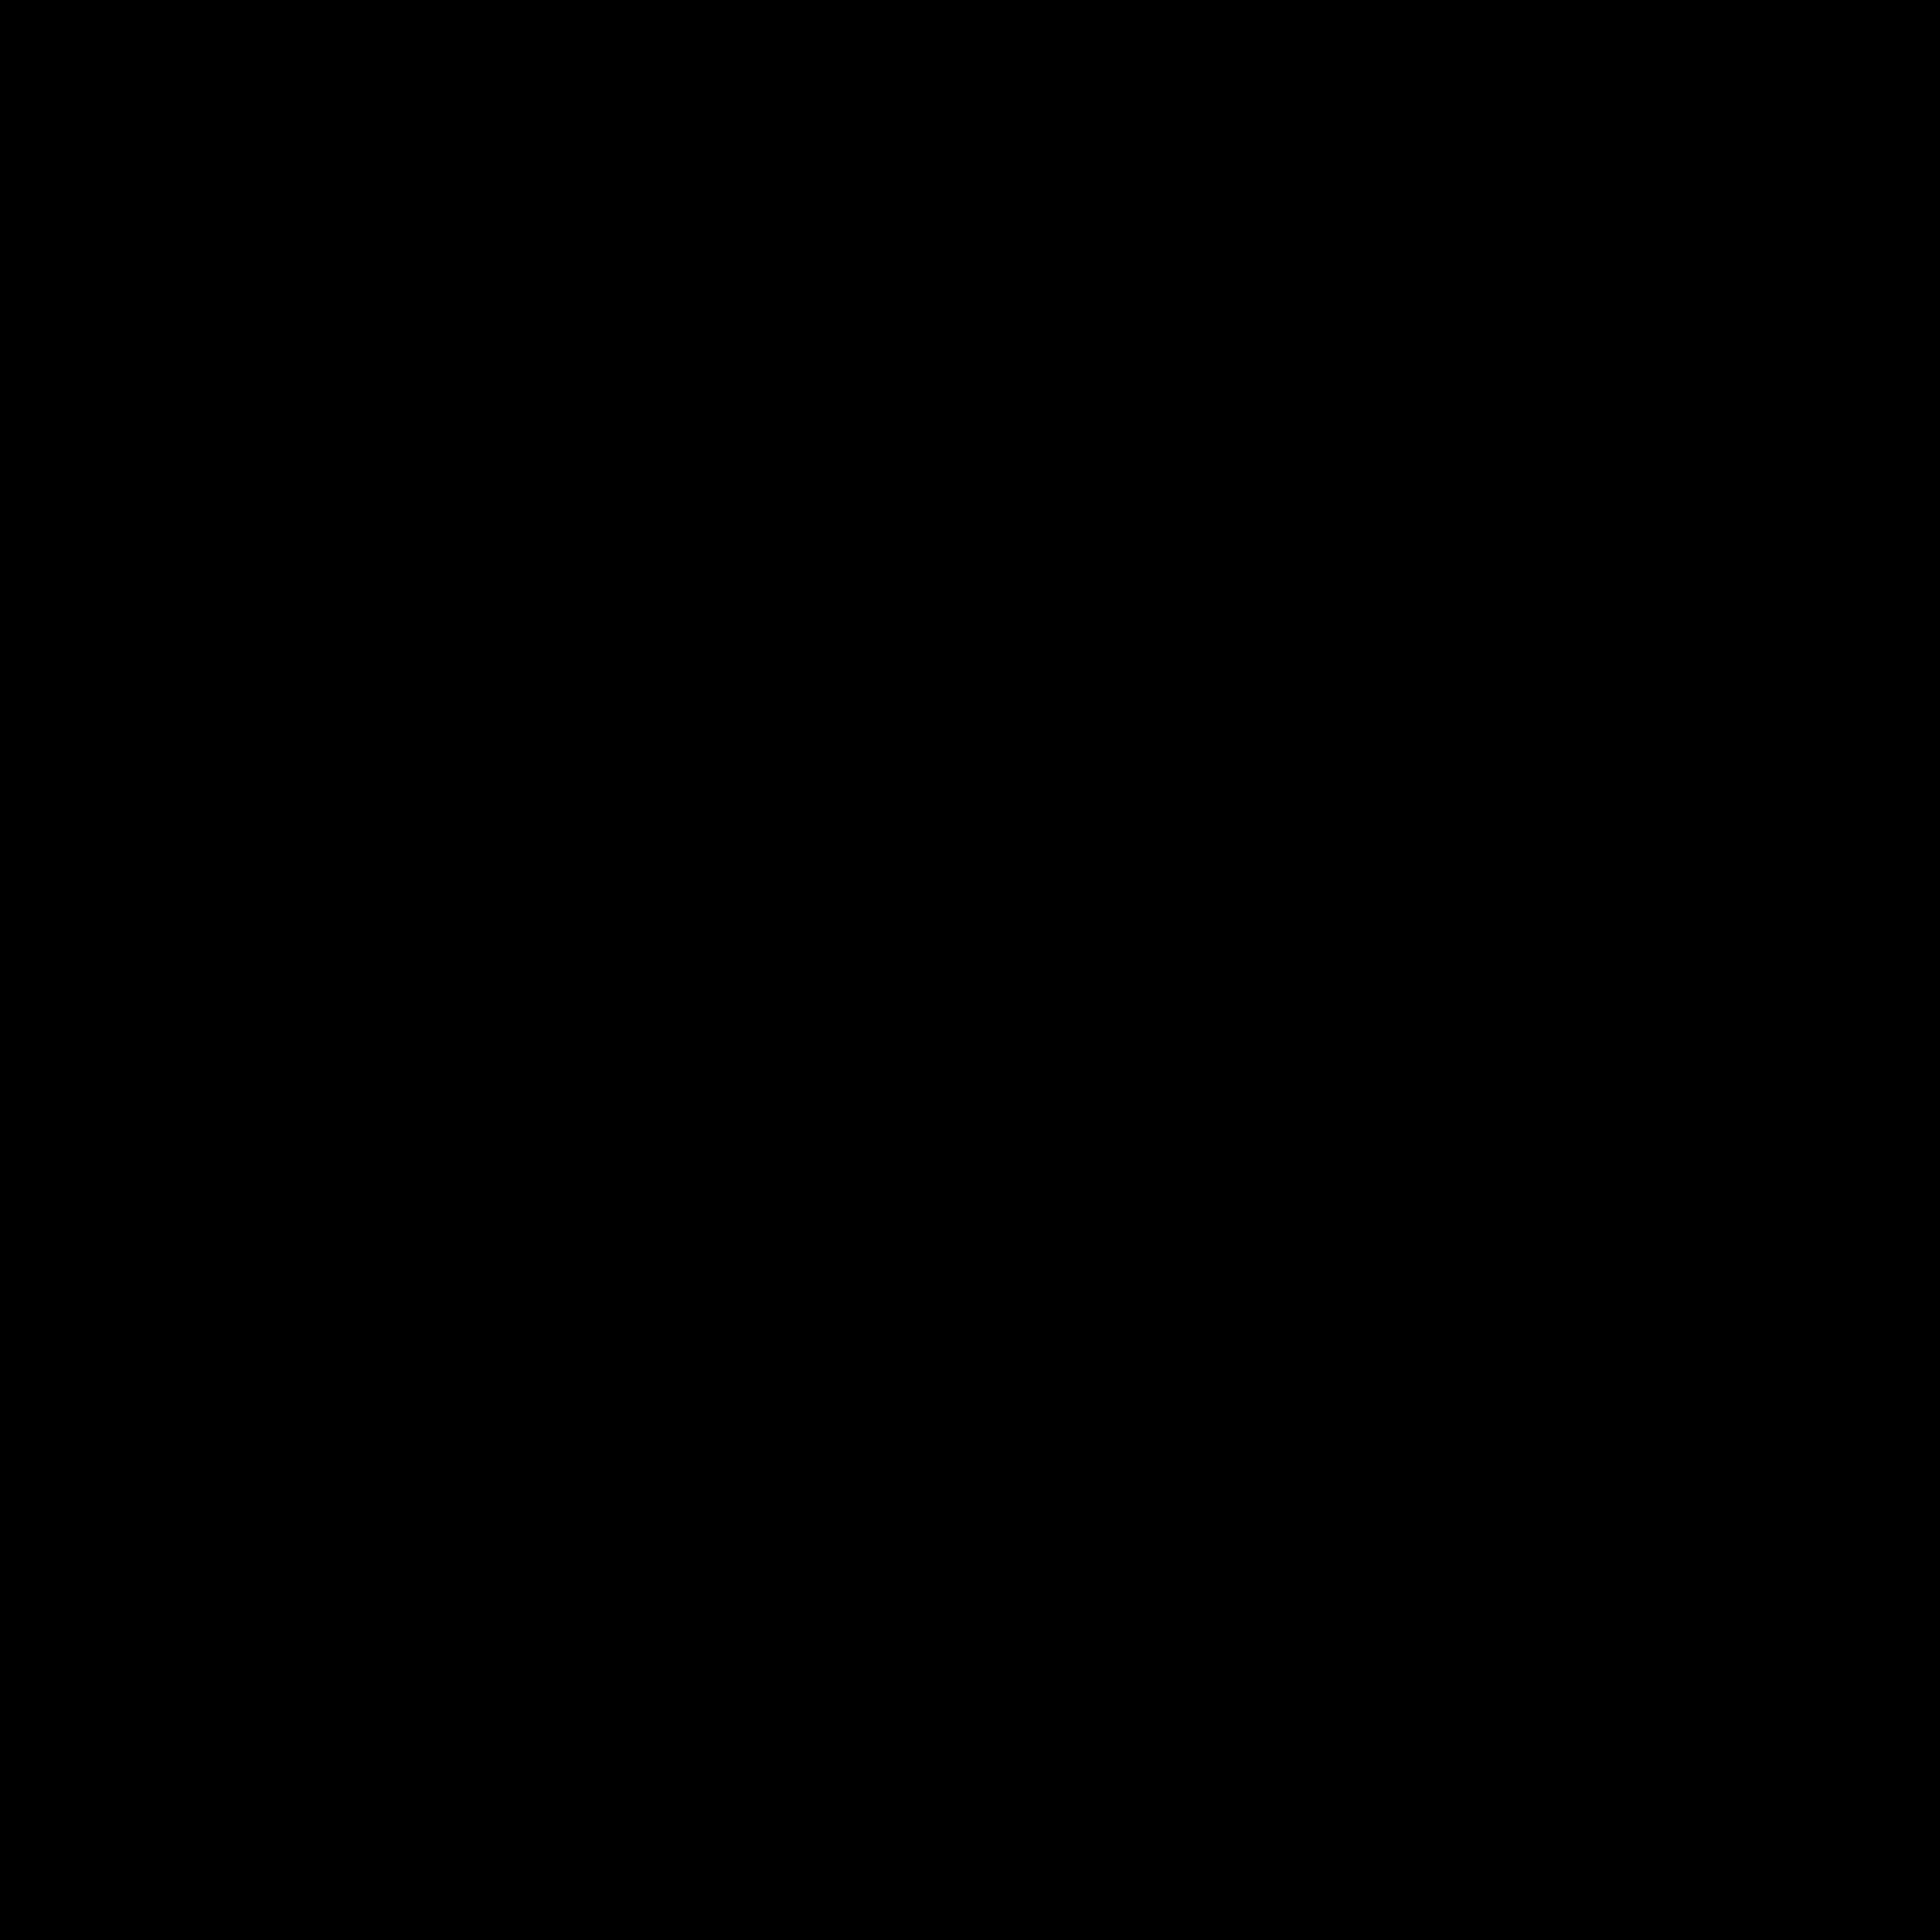 royalty free download Yamaha Drums Logo PNG Transparent